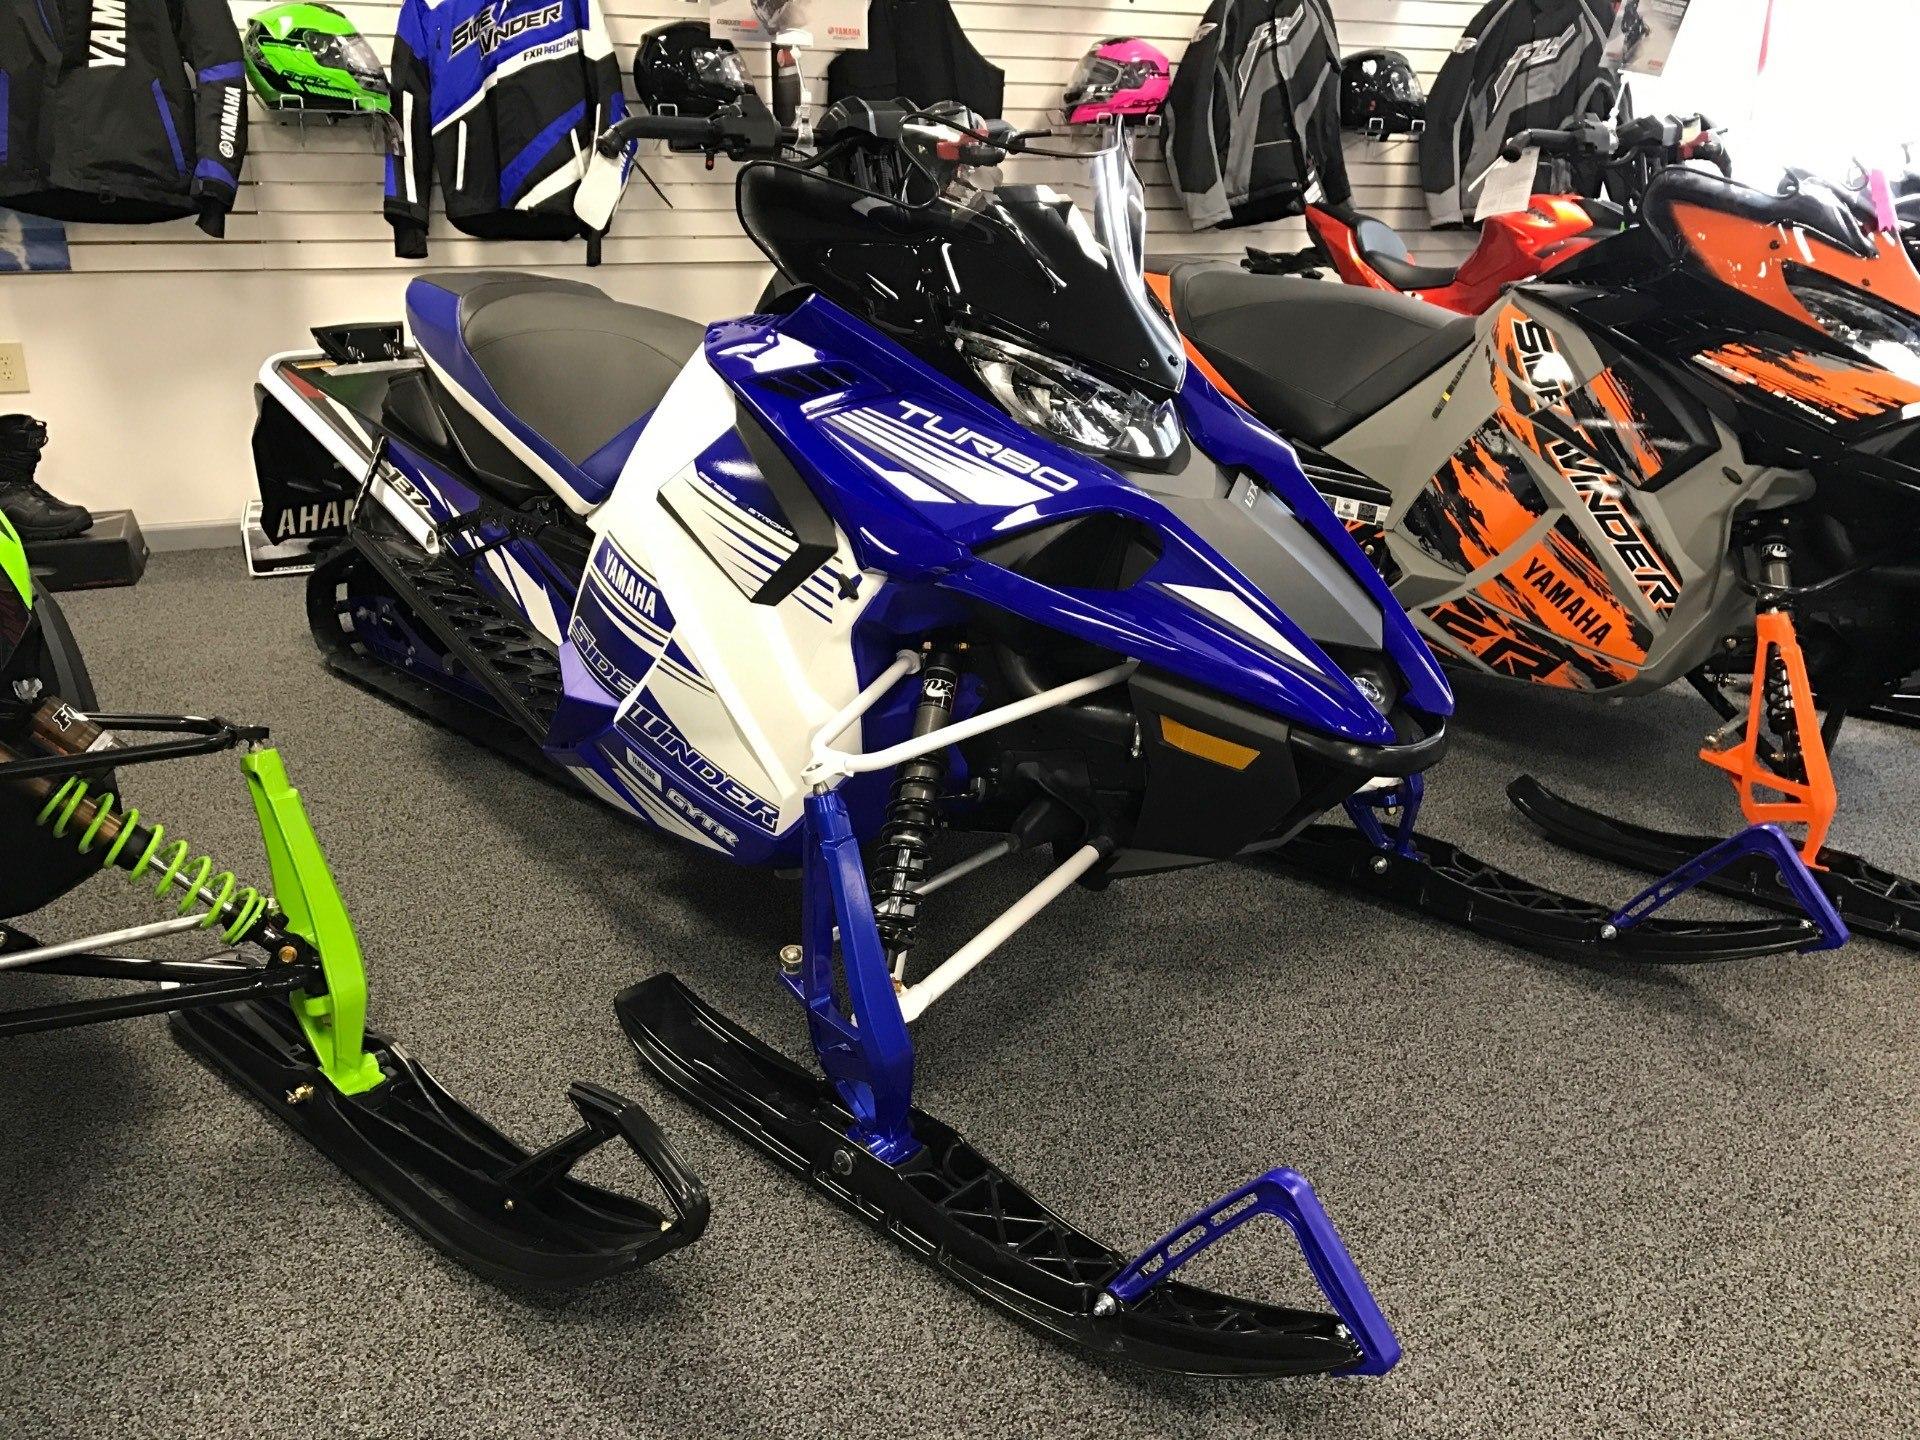 2017 Yamaha SIDEWINDER for sale 1170